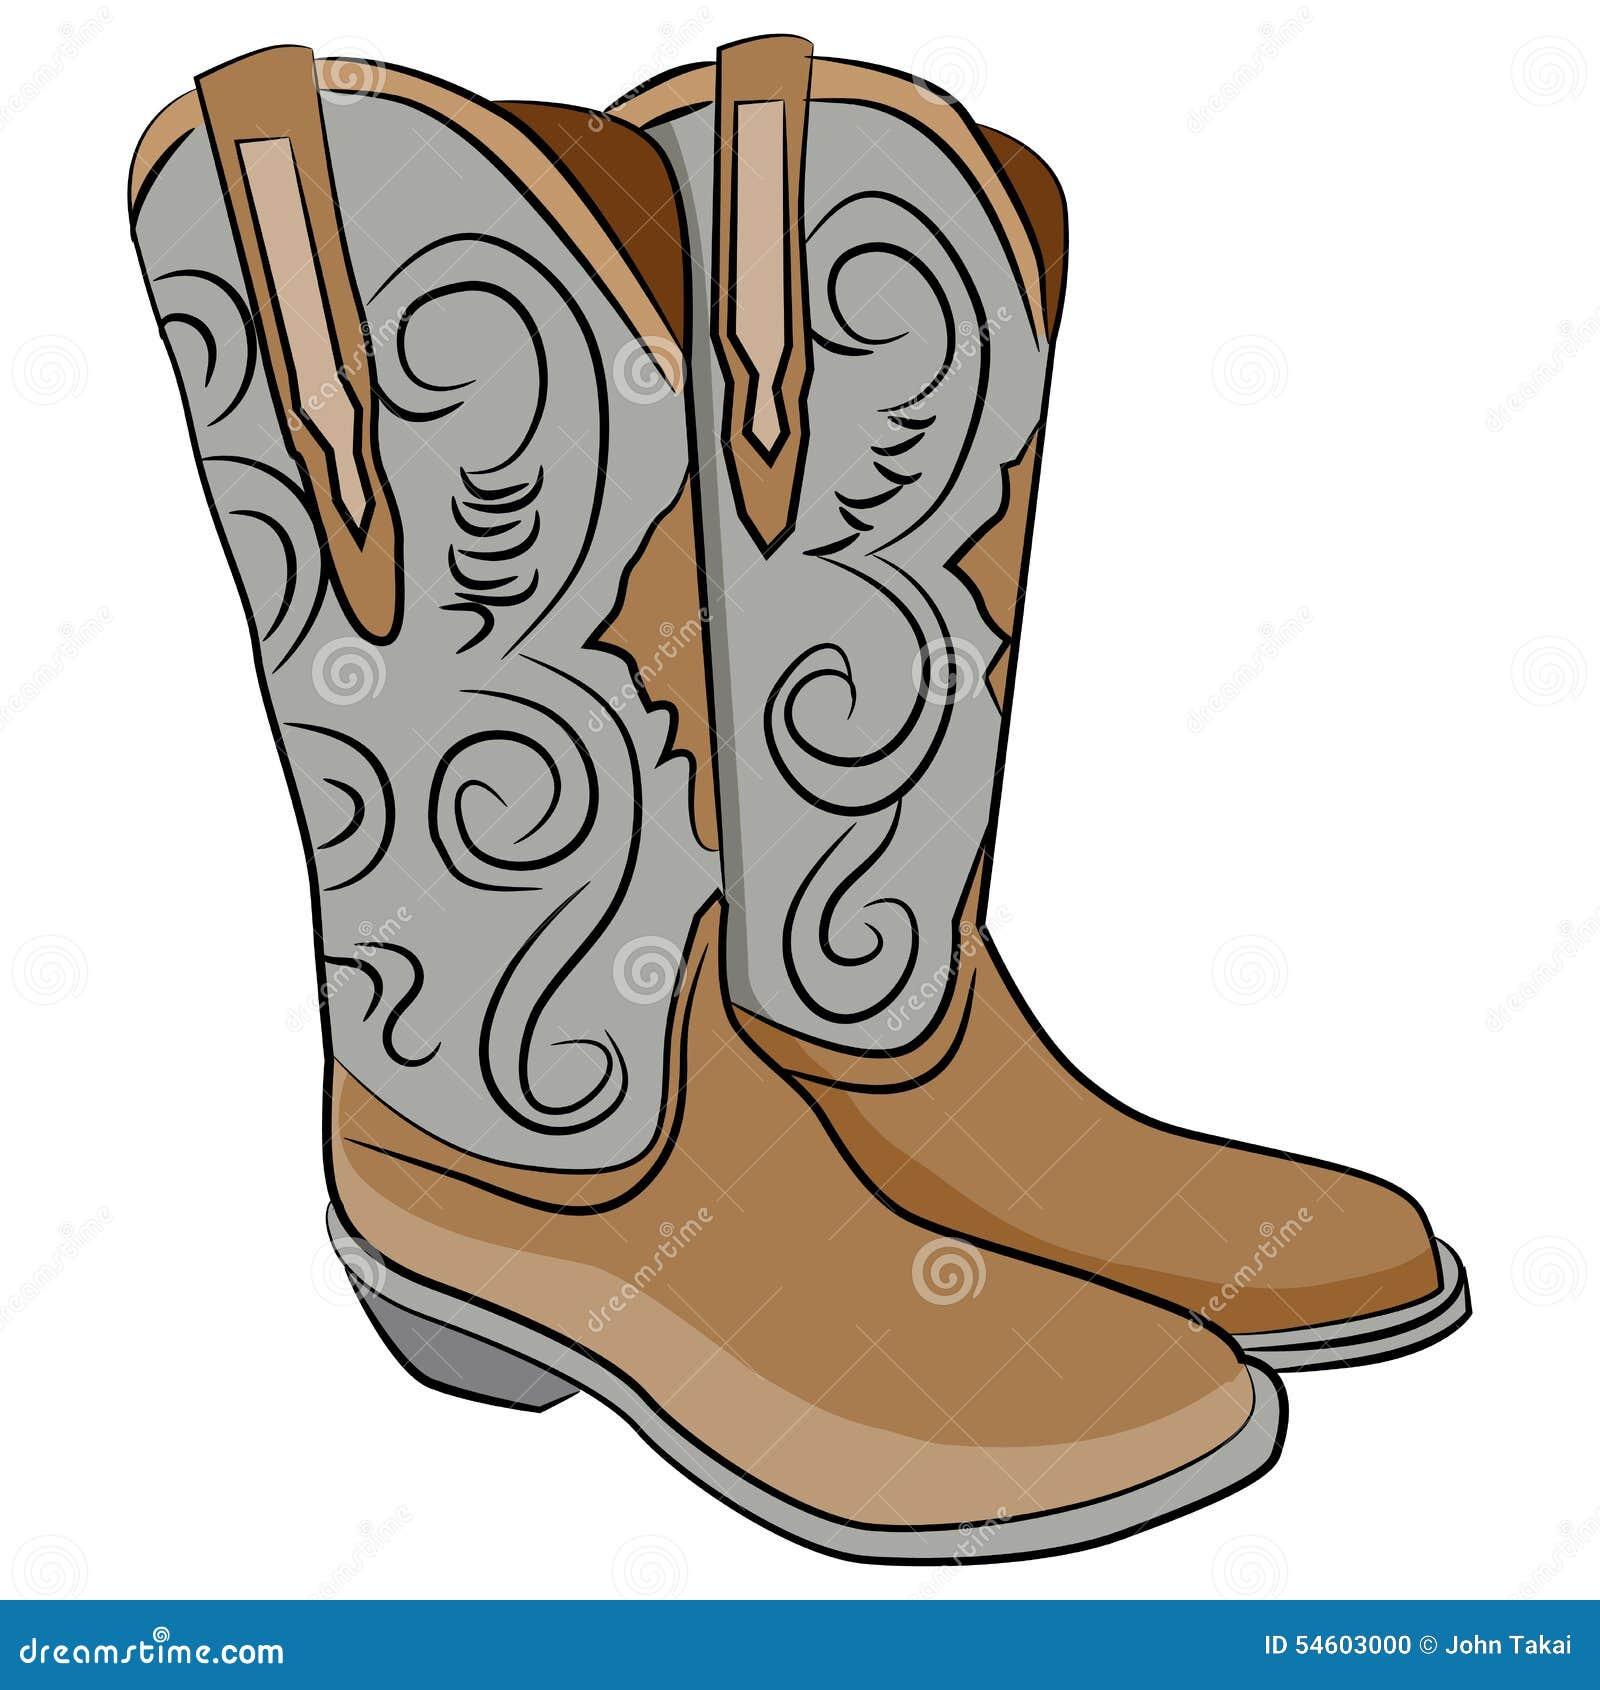 Cowboy Boots Cartoon Stock Vector - Image: 54603000